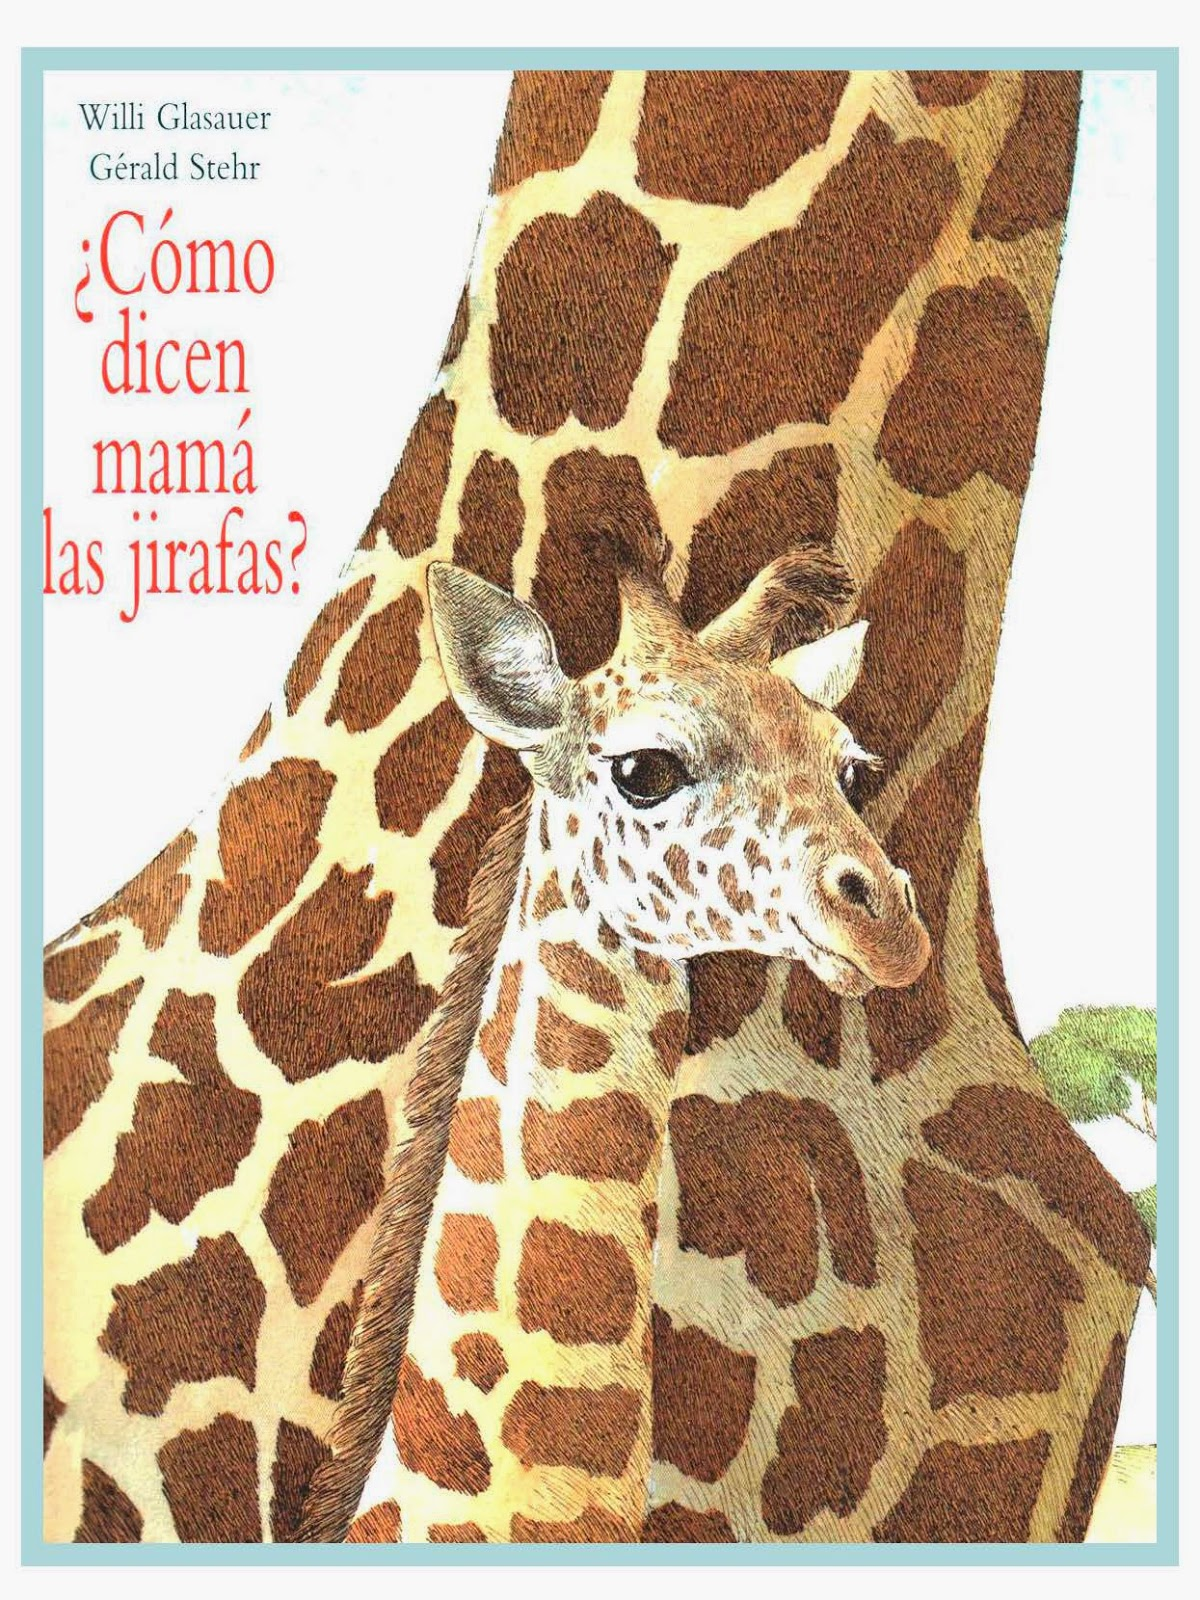 issuu.com/asuncioncabello/docs/como_dicen_mama_las_jirafas?e=1617168/7608841